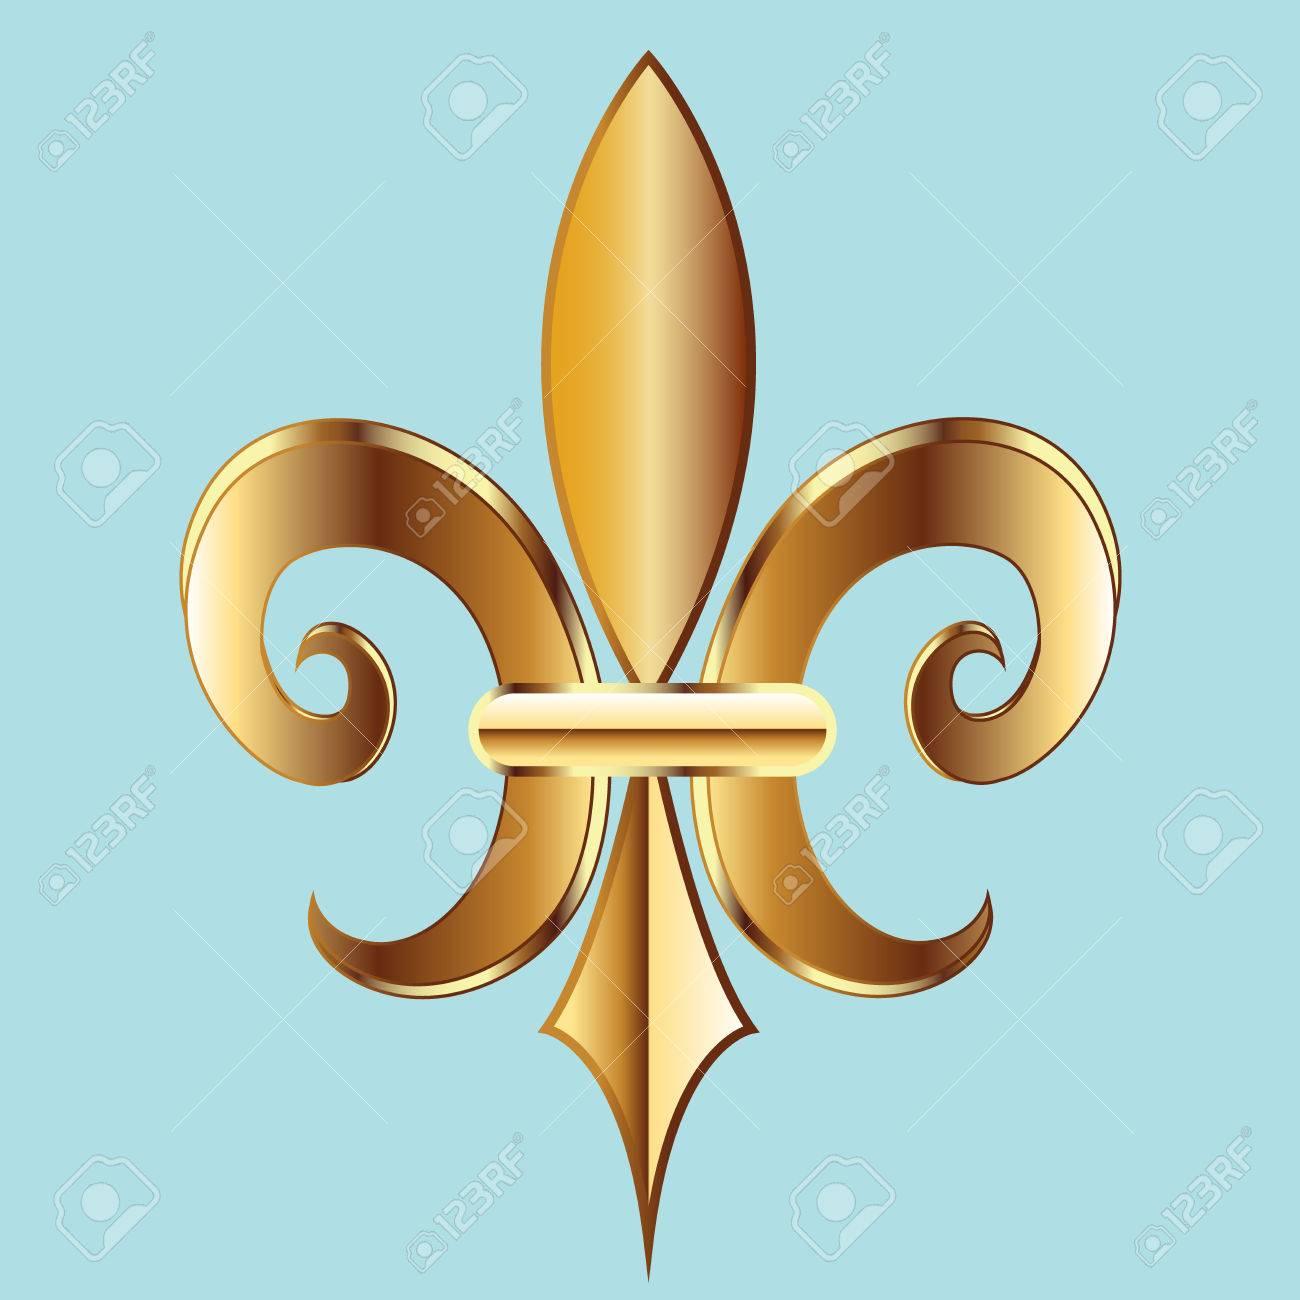 Gold fleur de lis new orleans golden symbol flower logo icon new orleans golden symbol flower logo icon vector image template stock buycottarizona Choice Image